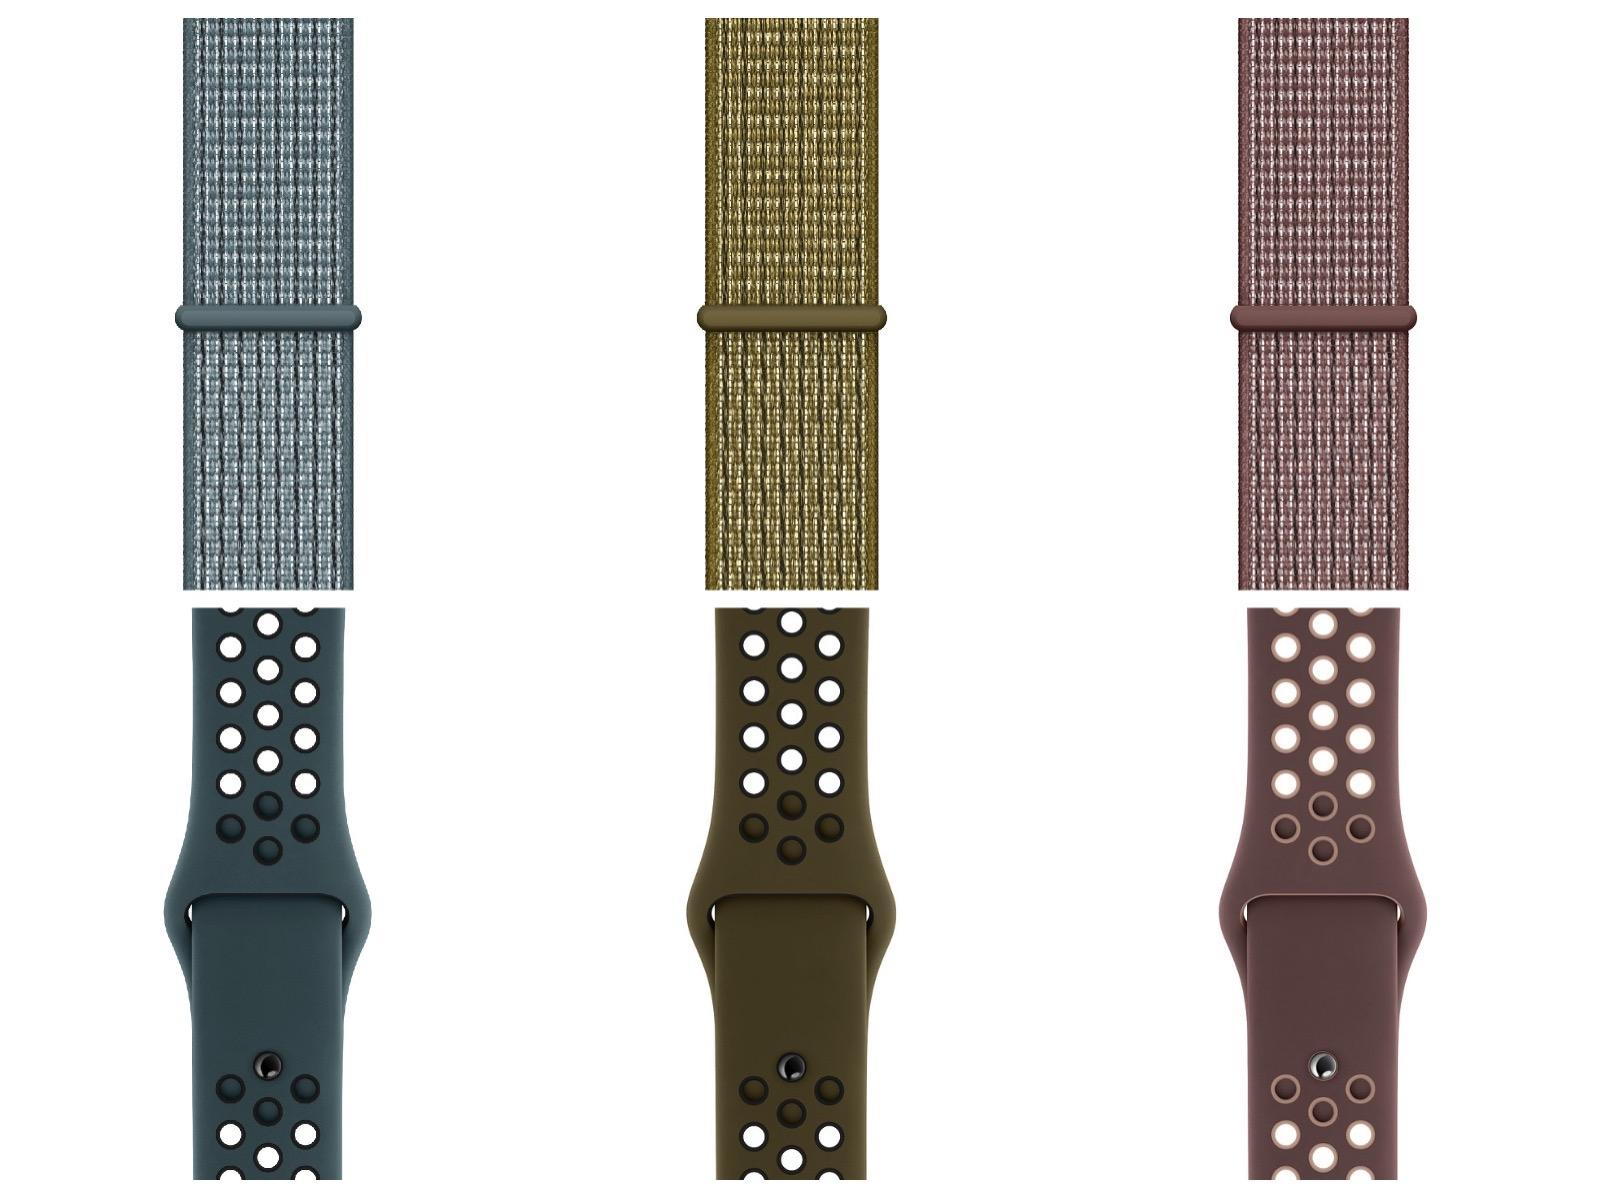 New-Apple-Watch-Nike-Bands.jpg